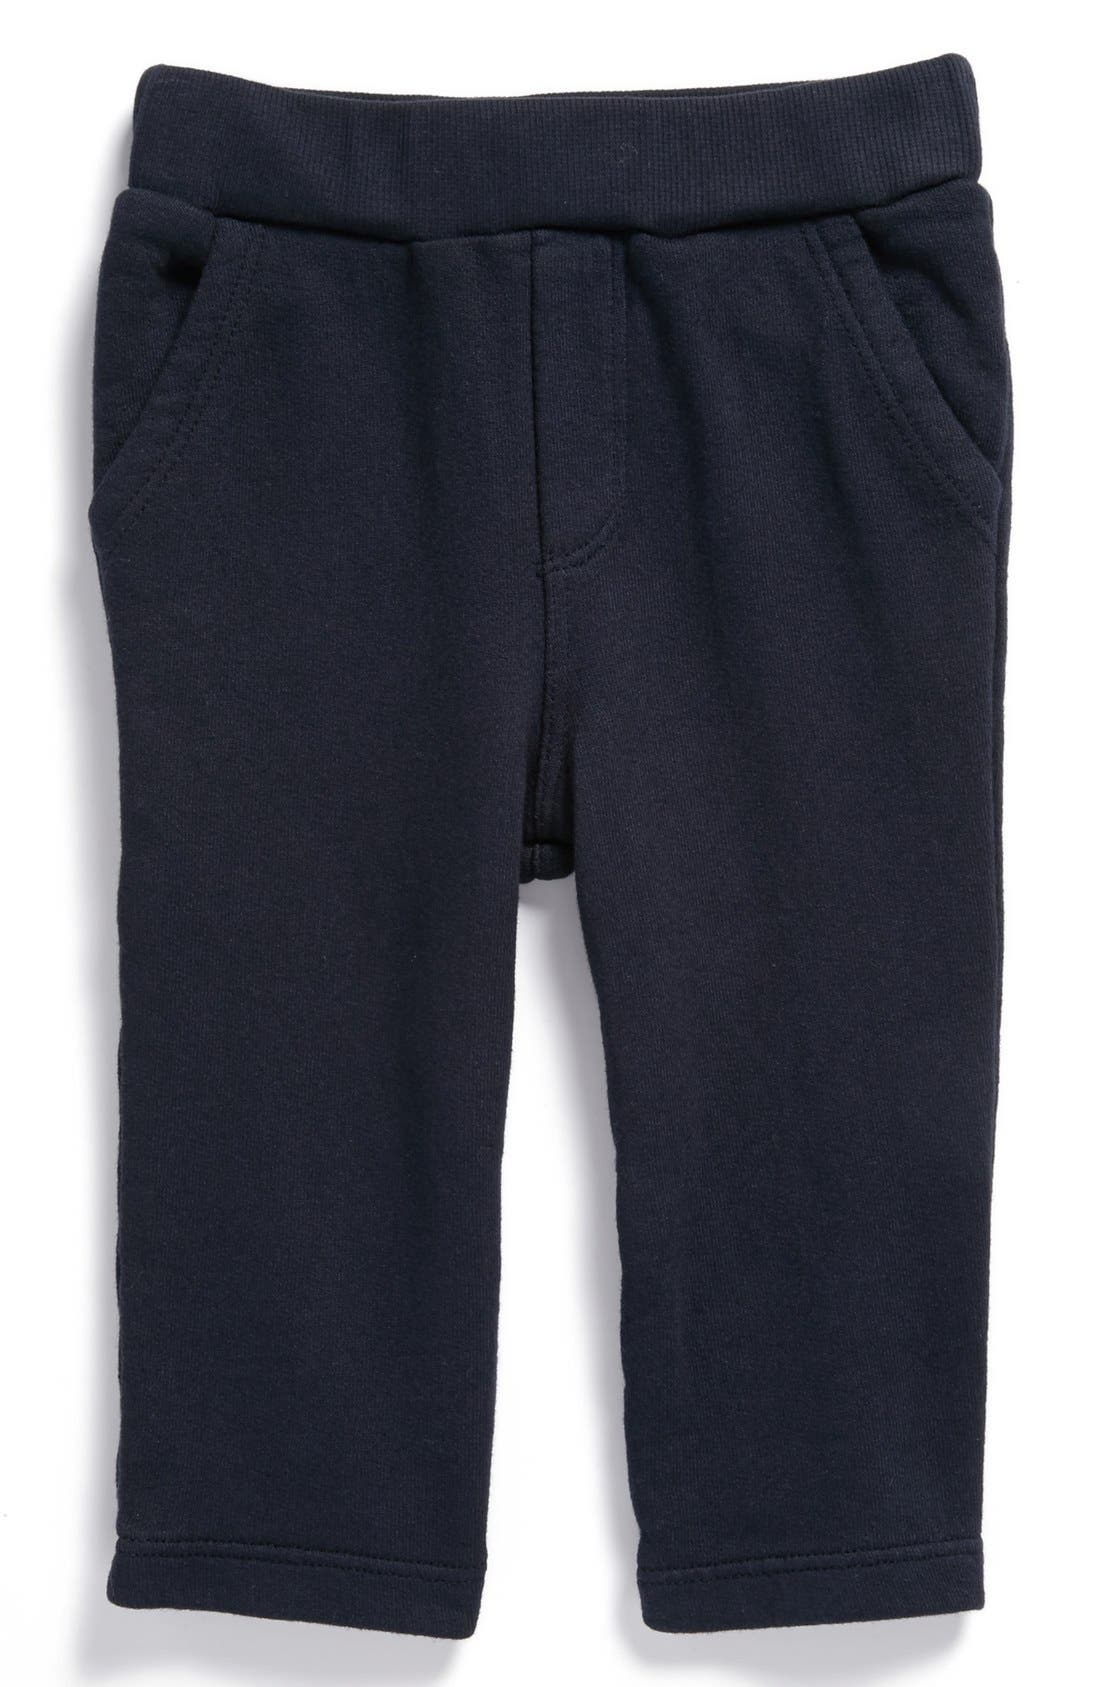 Alternate Image 1 Selected - Splendid 'Off Duty' Pants (Baby)